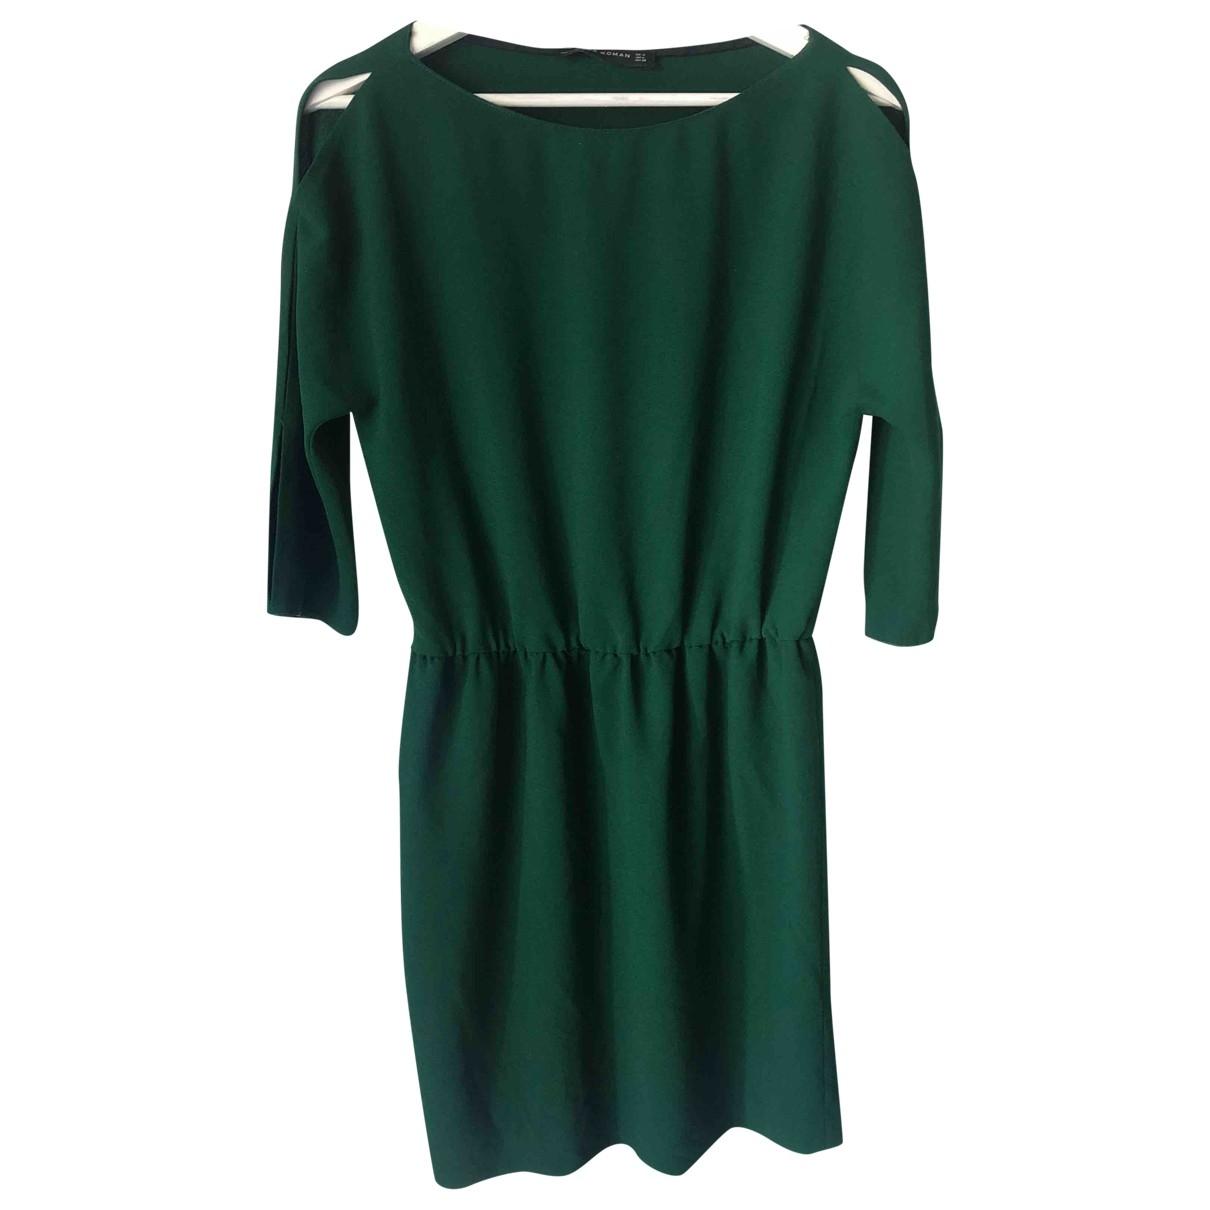 Zara \N Green dress for Women M International